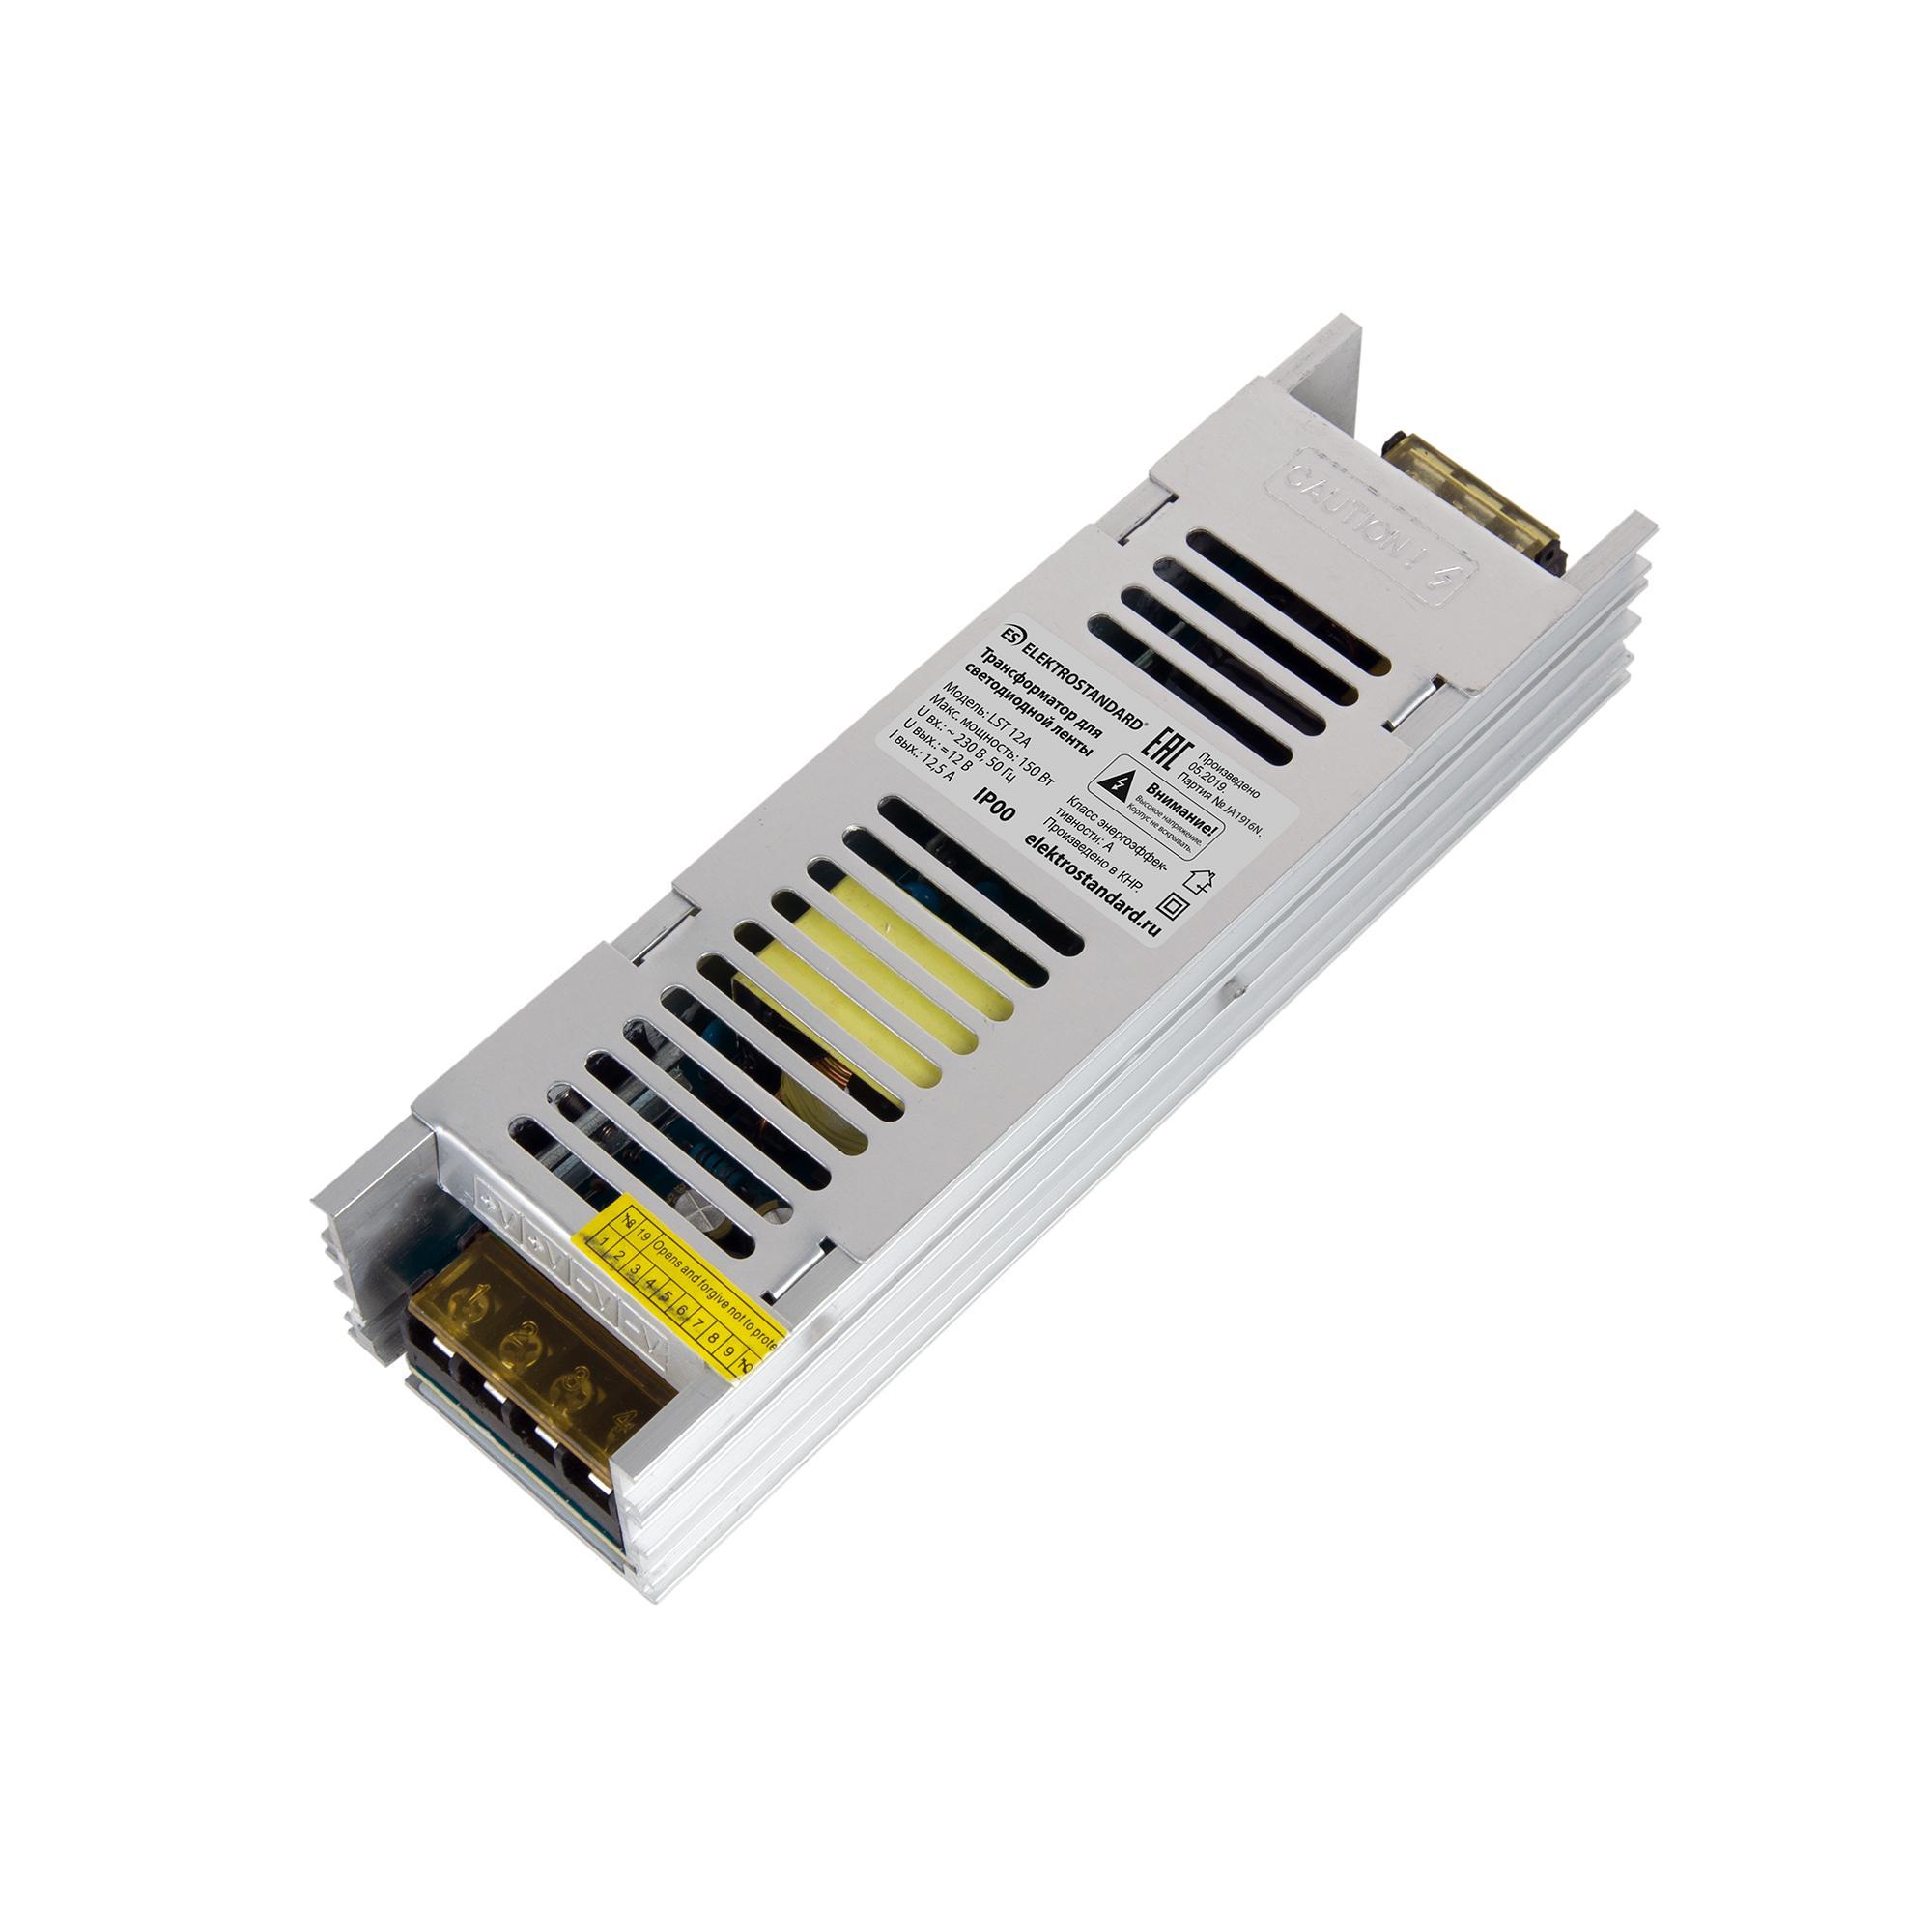 Трансформатор 150W 12V IP00 LST 12A